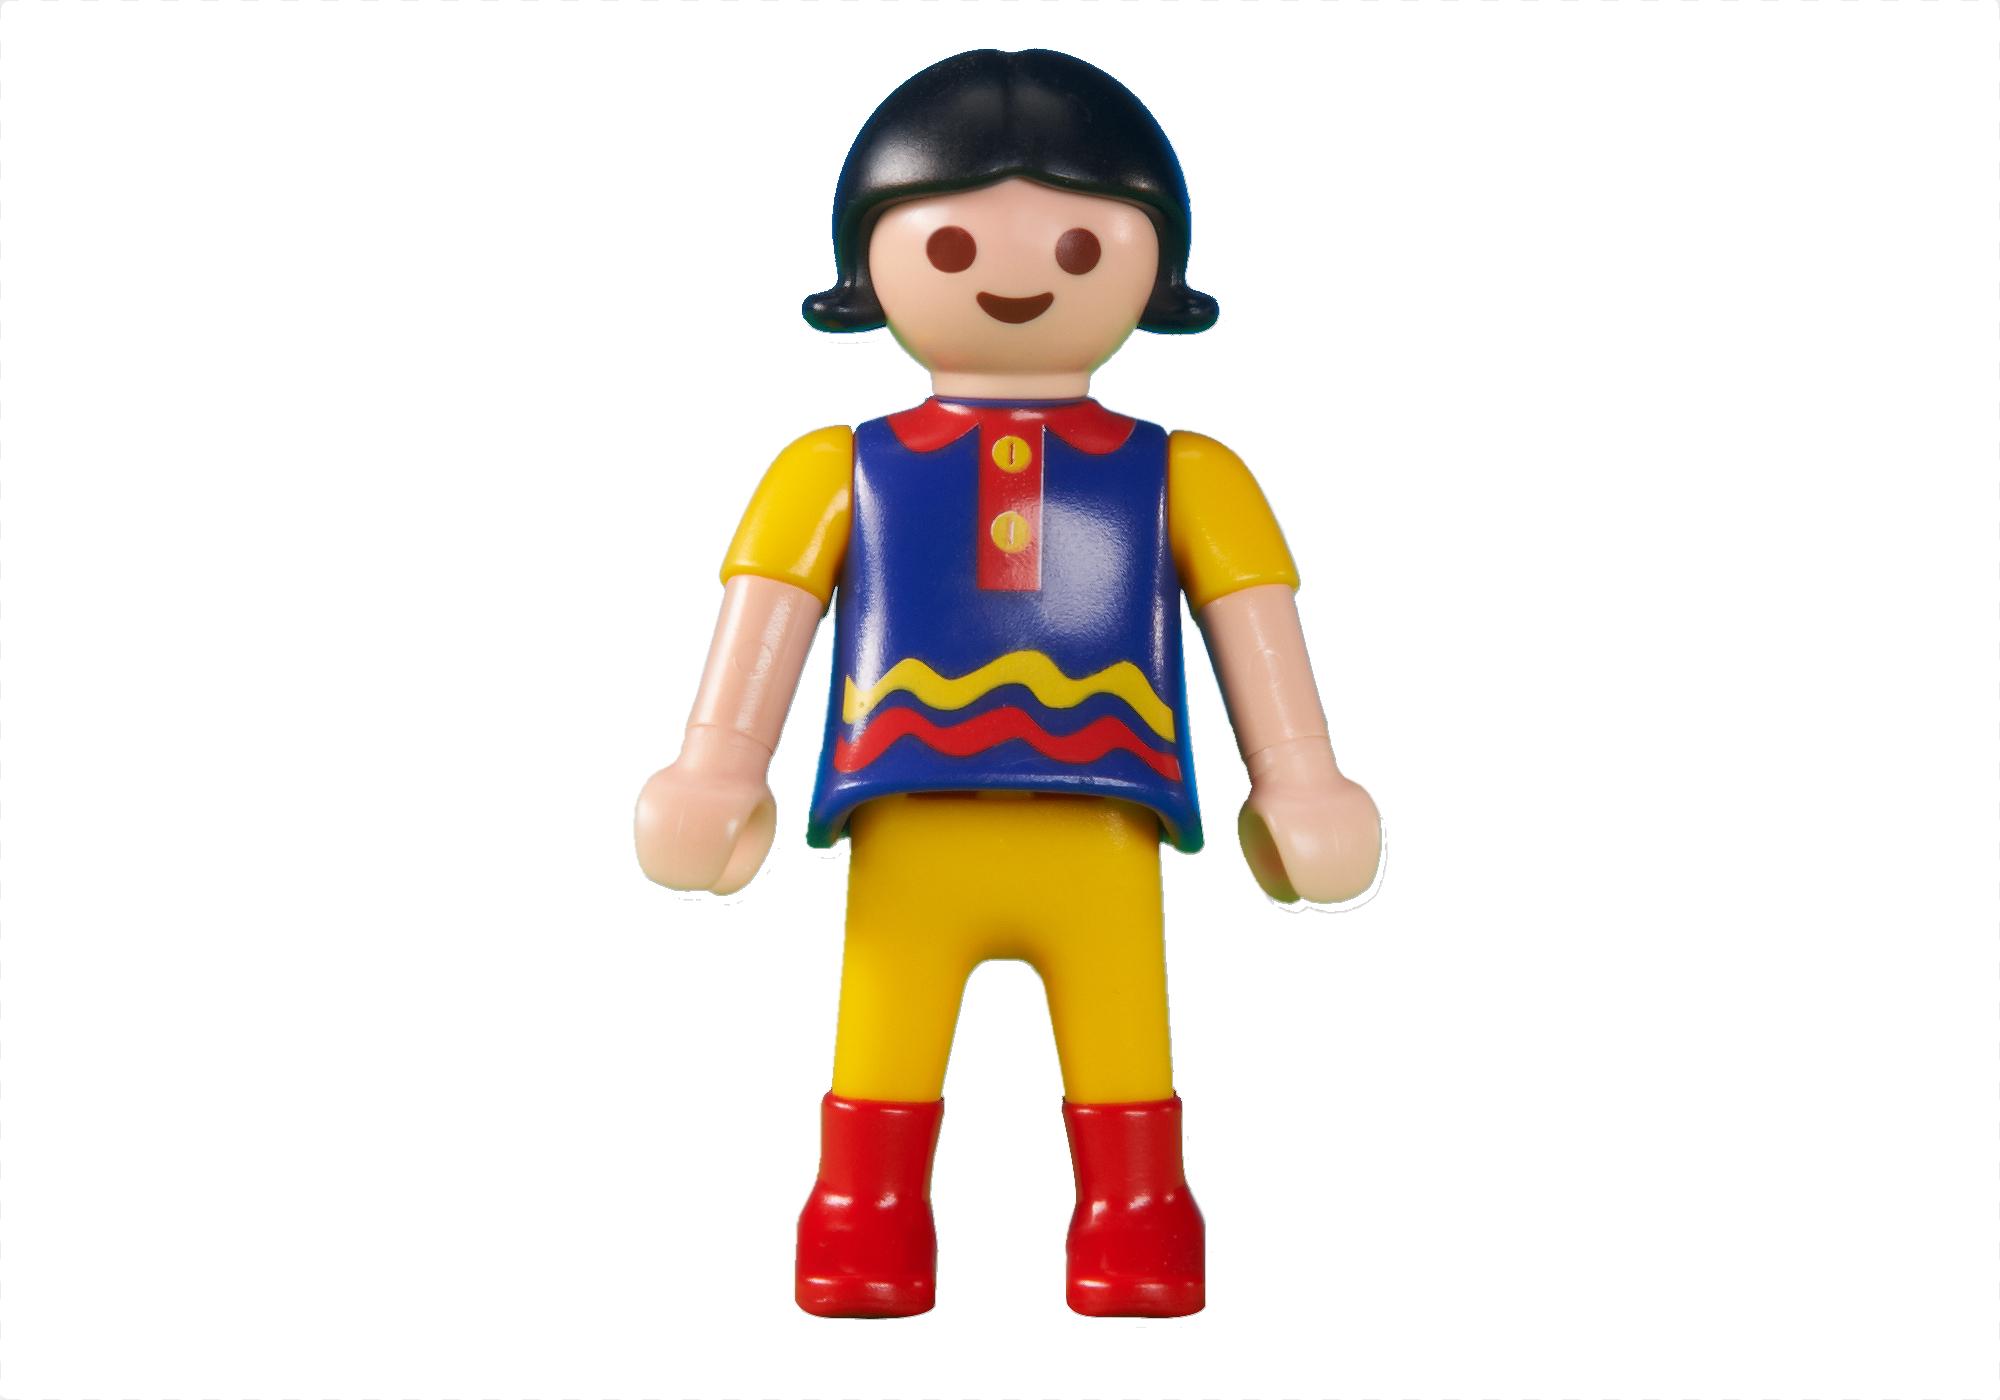 http://media.playmobil.com/i/playmobil/30111390_product_detail